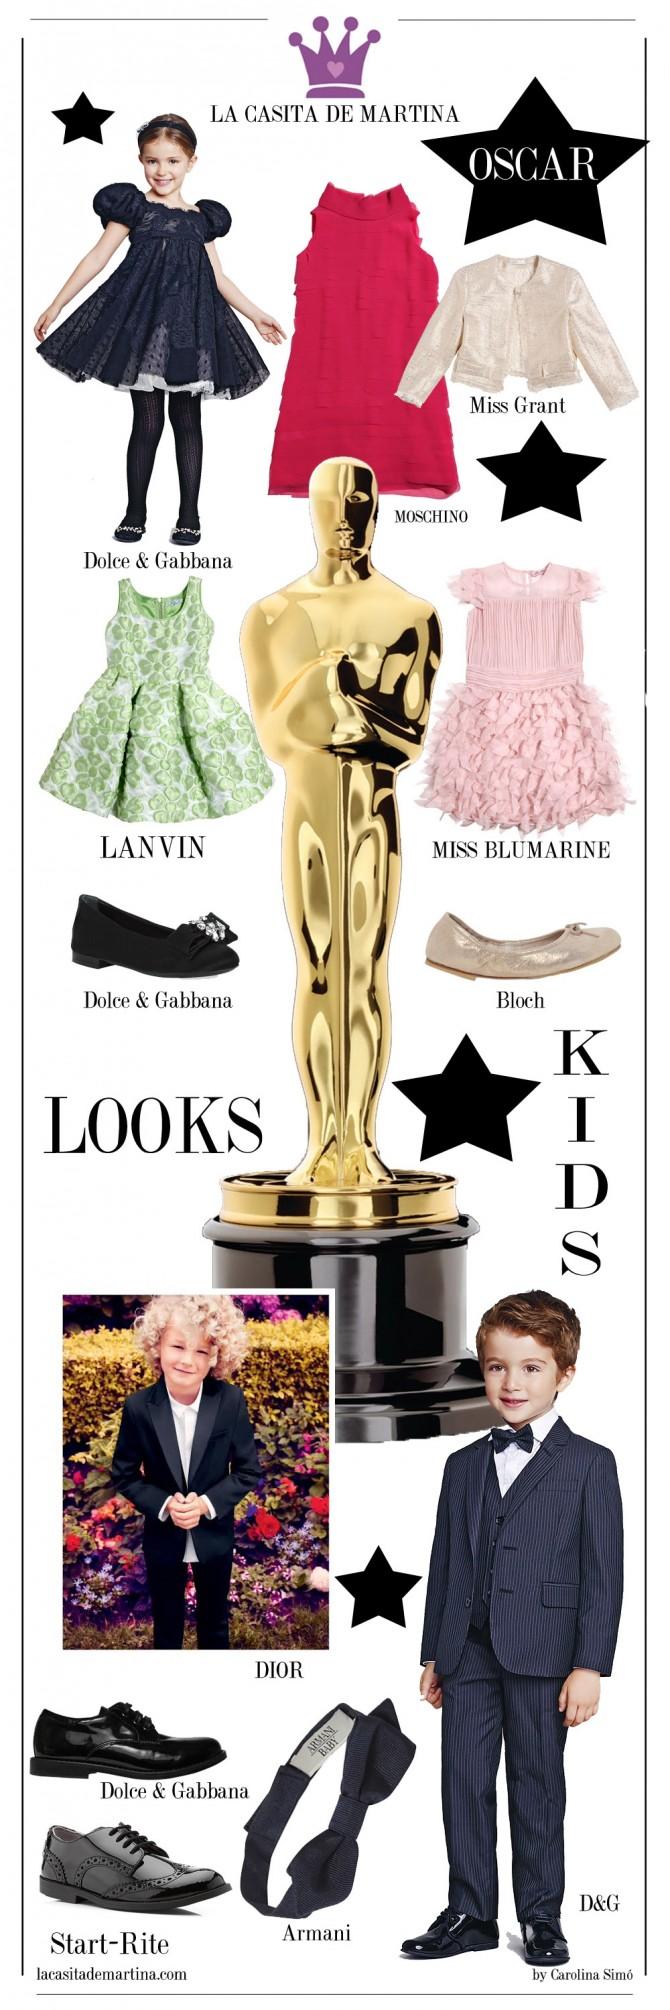 Oscars 2014, Moda Niños, La casita de Martina, Blog Moda Infantil, Ropa vestir niños